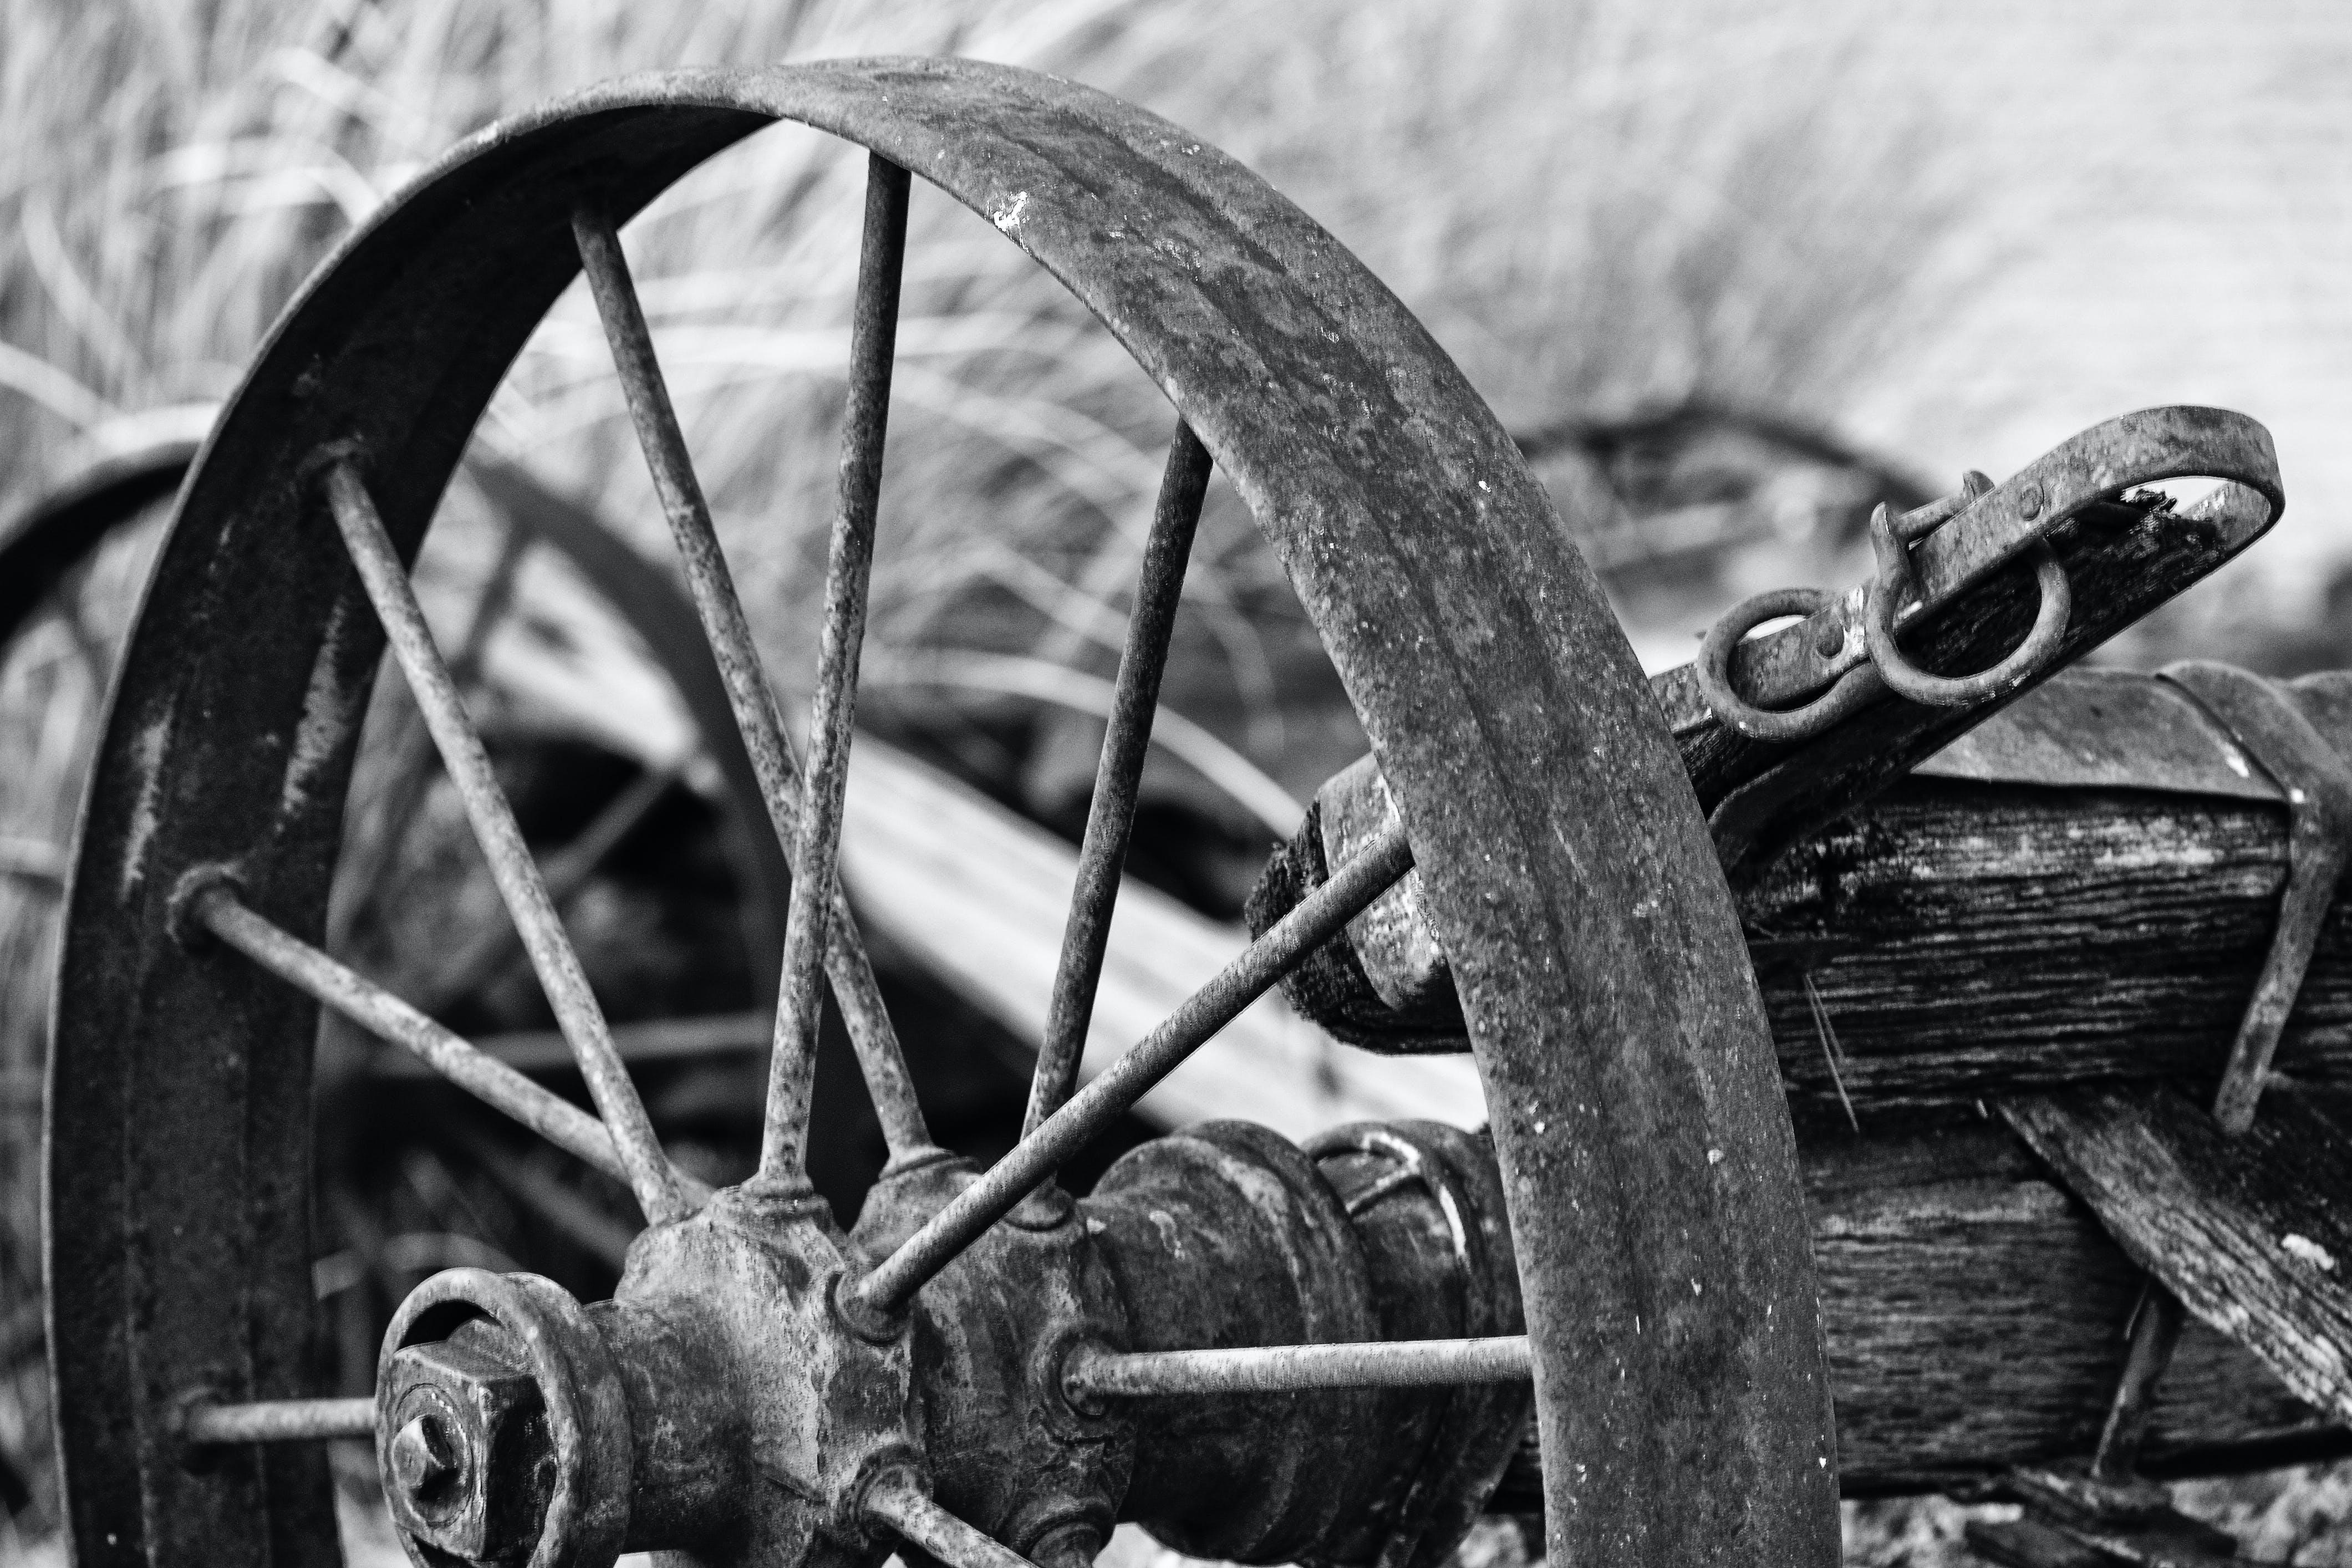 Rusted Wheel Grayscale Photo